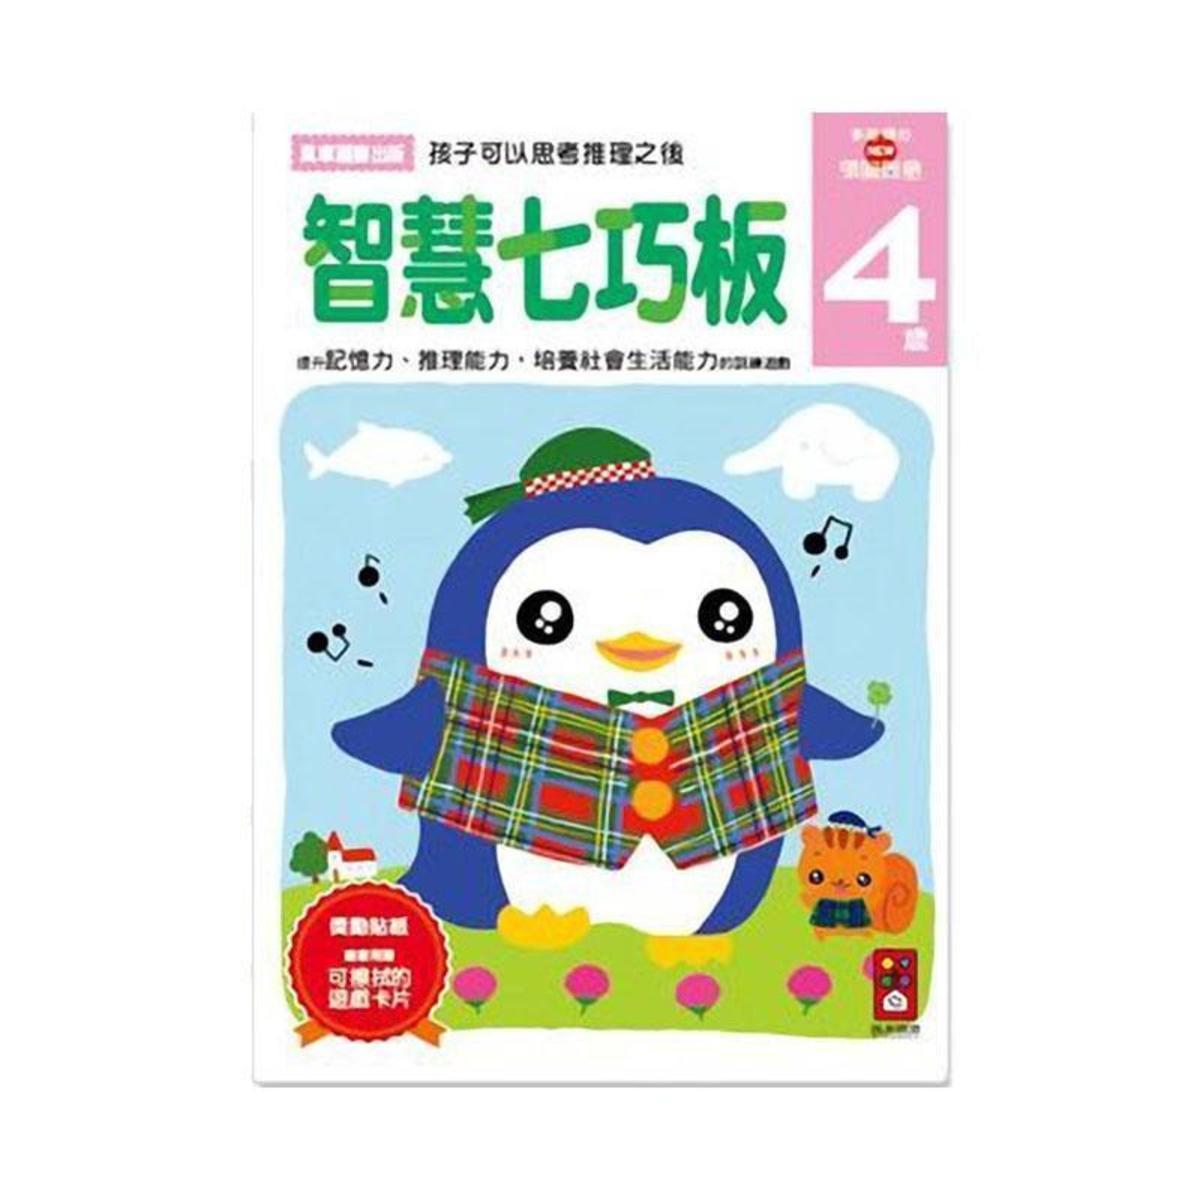 Publishing Wisdom Tangram 4 years old - Multi-Huhui's NEW Mind Development Taiwan Import